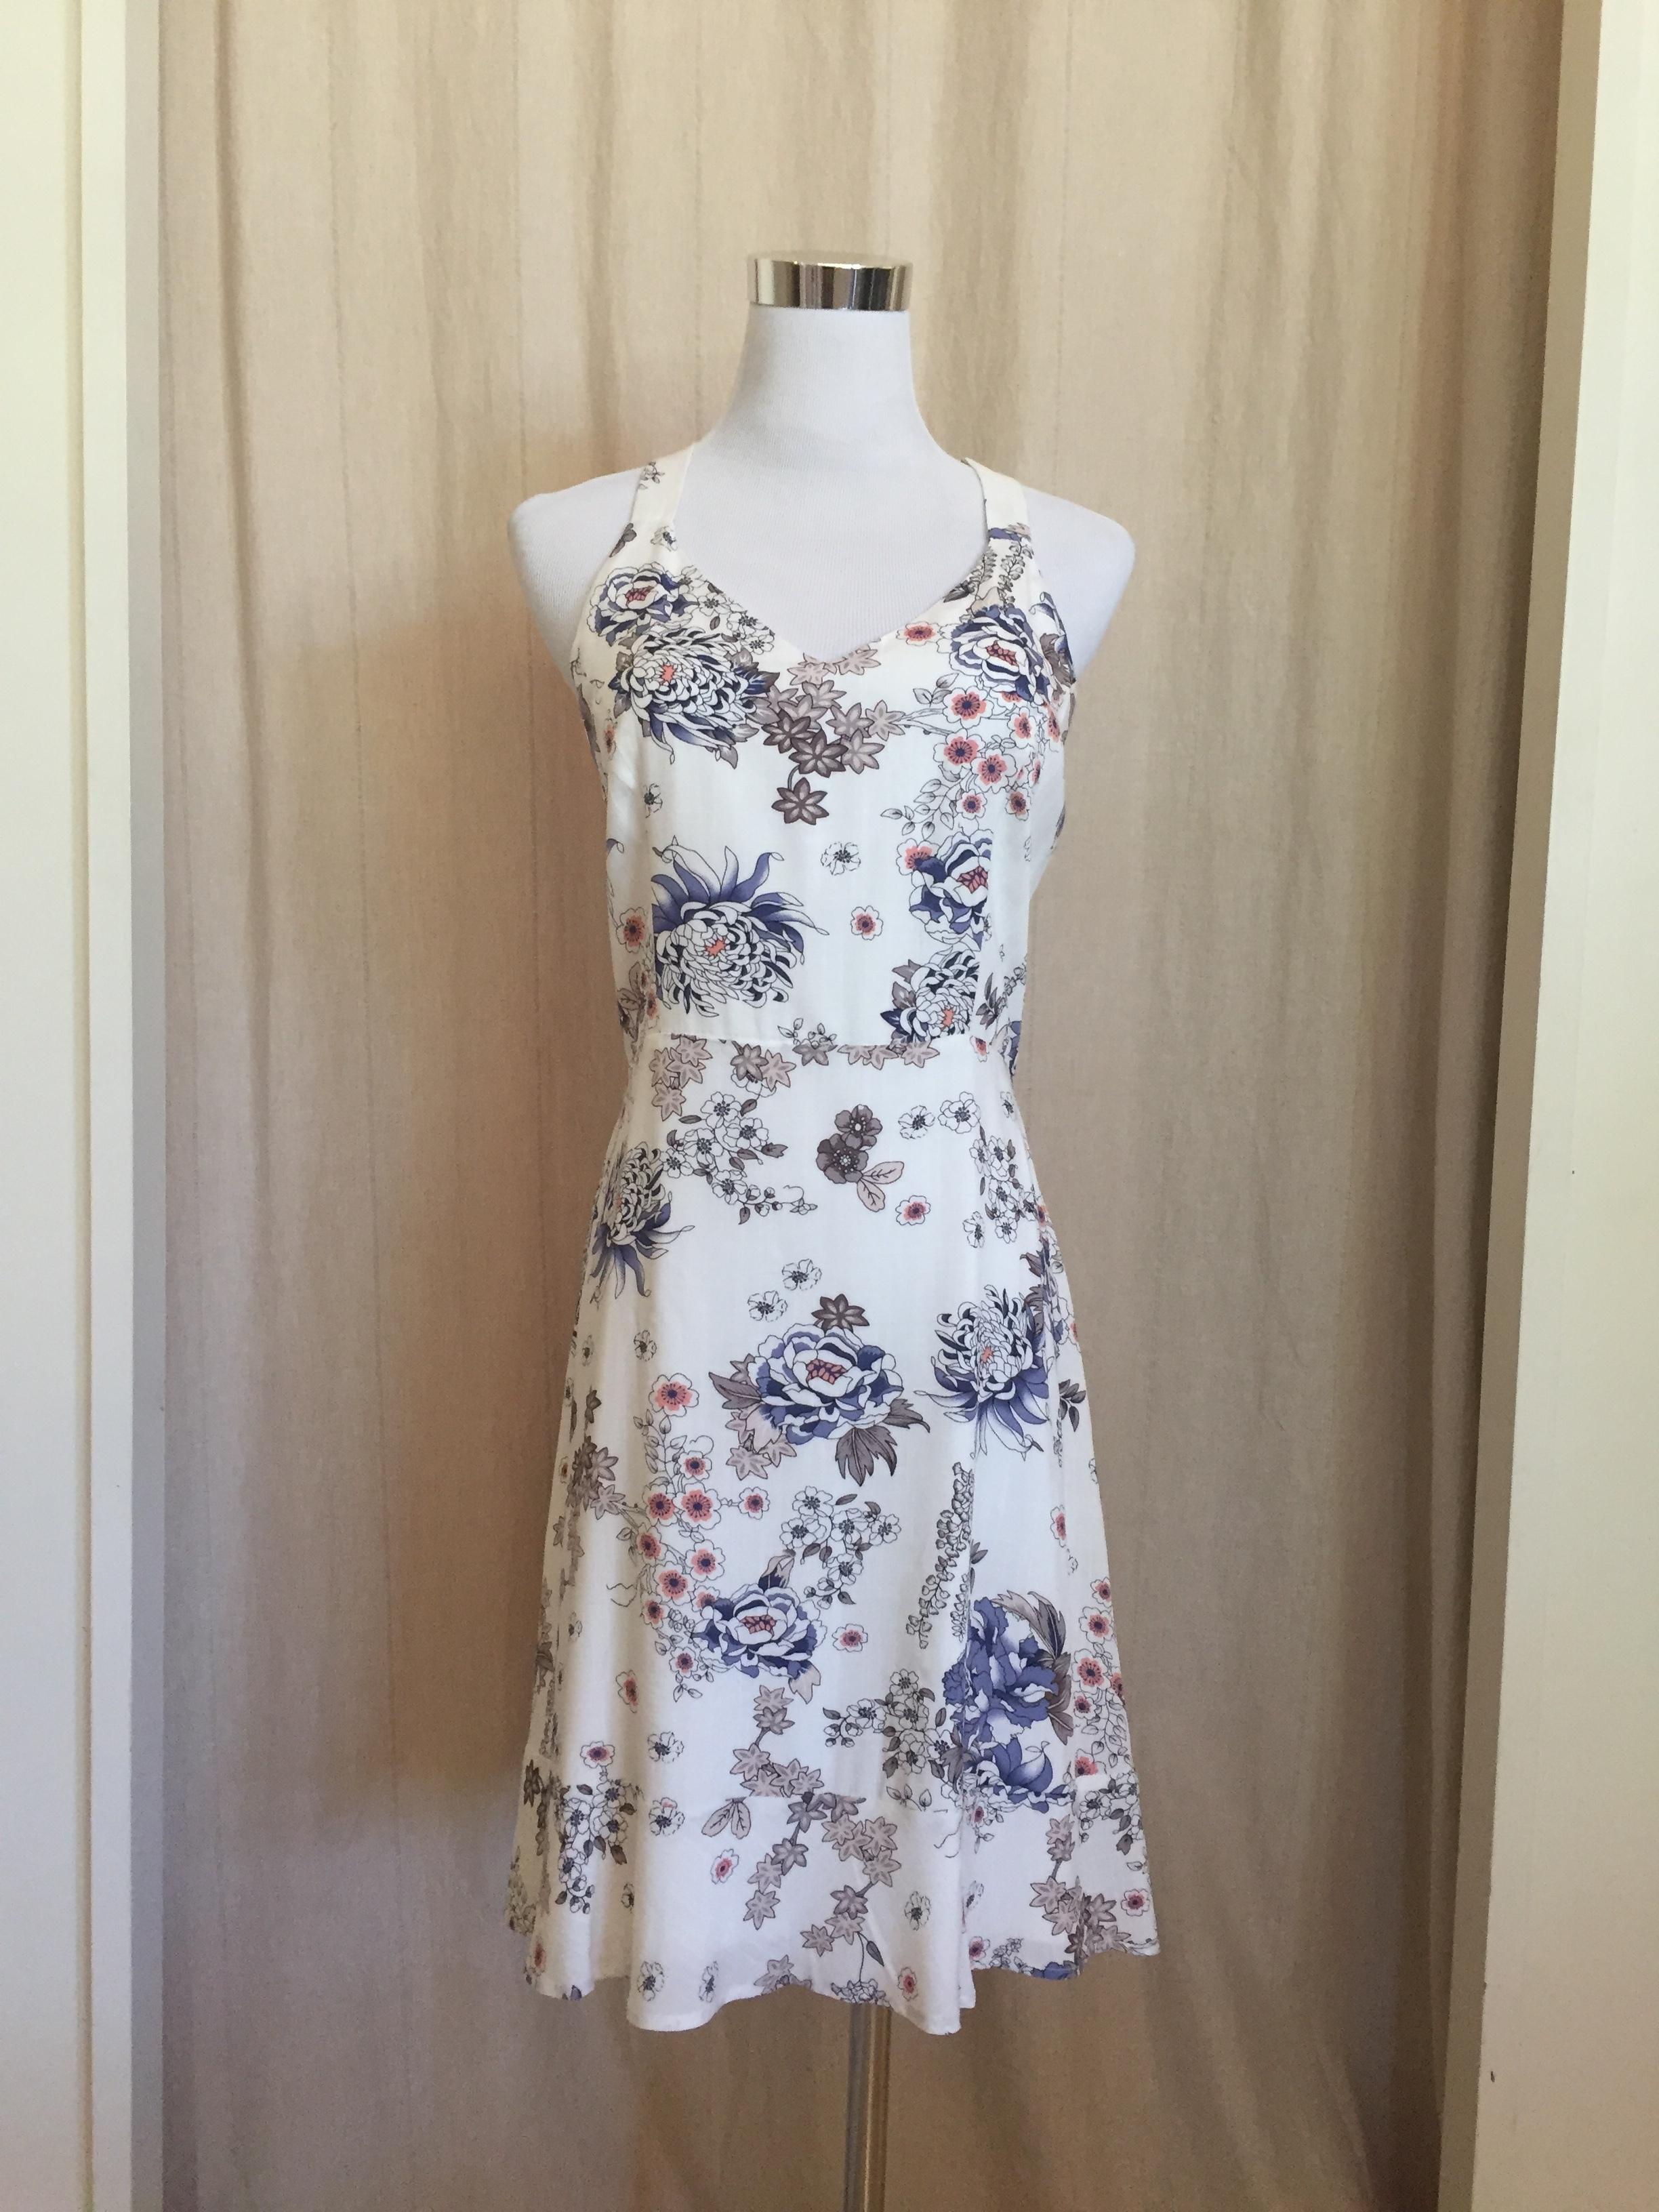 Strappy Printed Dress, $54